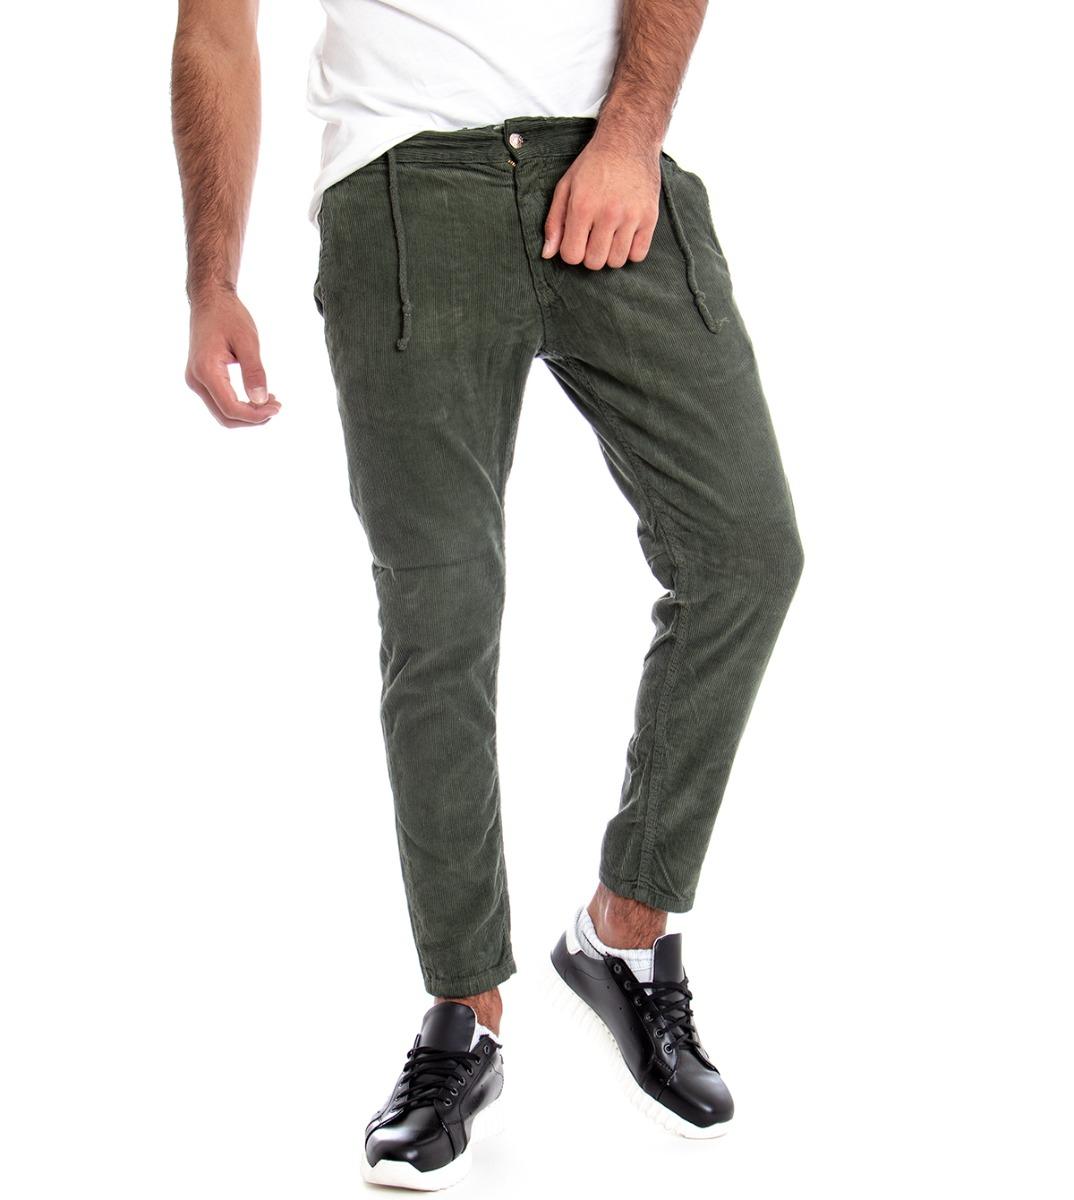 Pantalone-Uomo-Tasca-America-Velluto-Rigato-Velvet-Tinta-Unita-Verde-GIOSAL miniatura 7